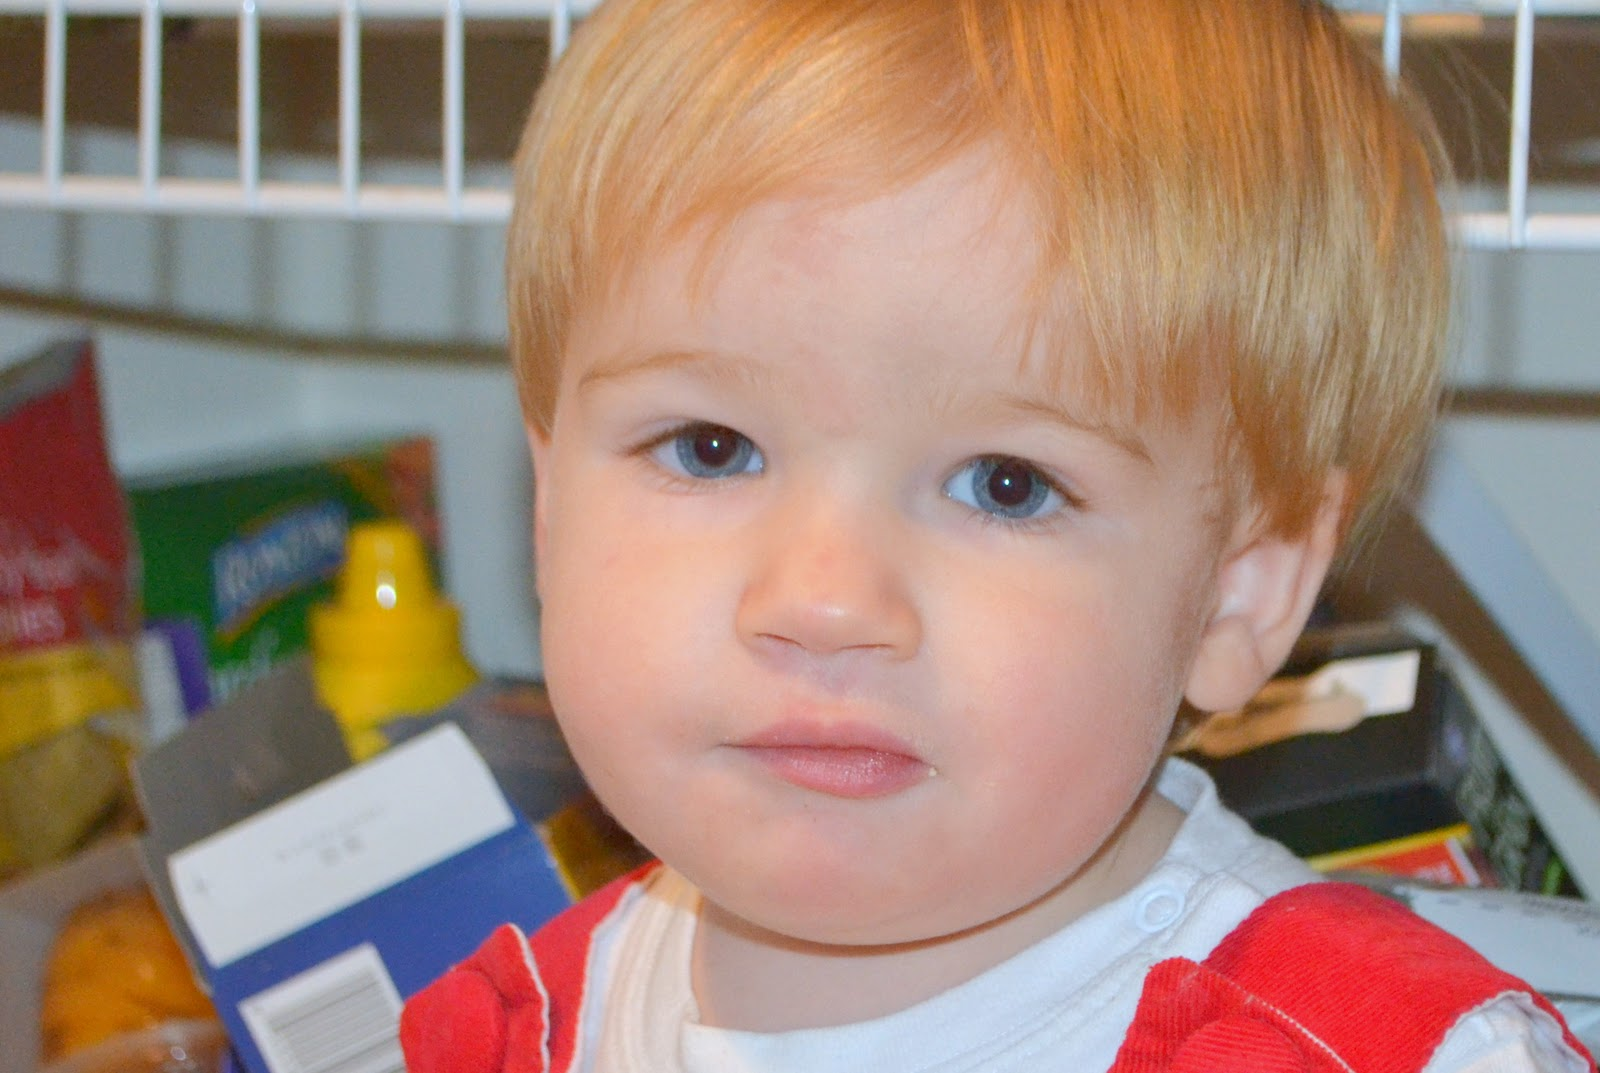 Klippel-Feil syndrome: signs, photo, treatment, prognosis 99